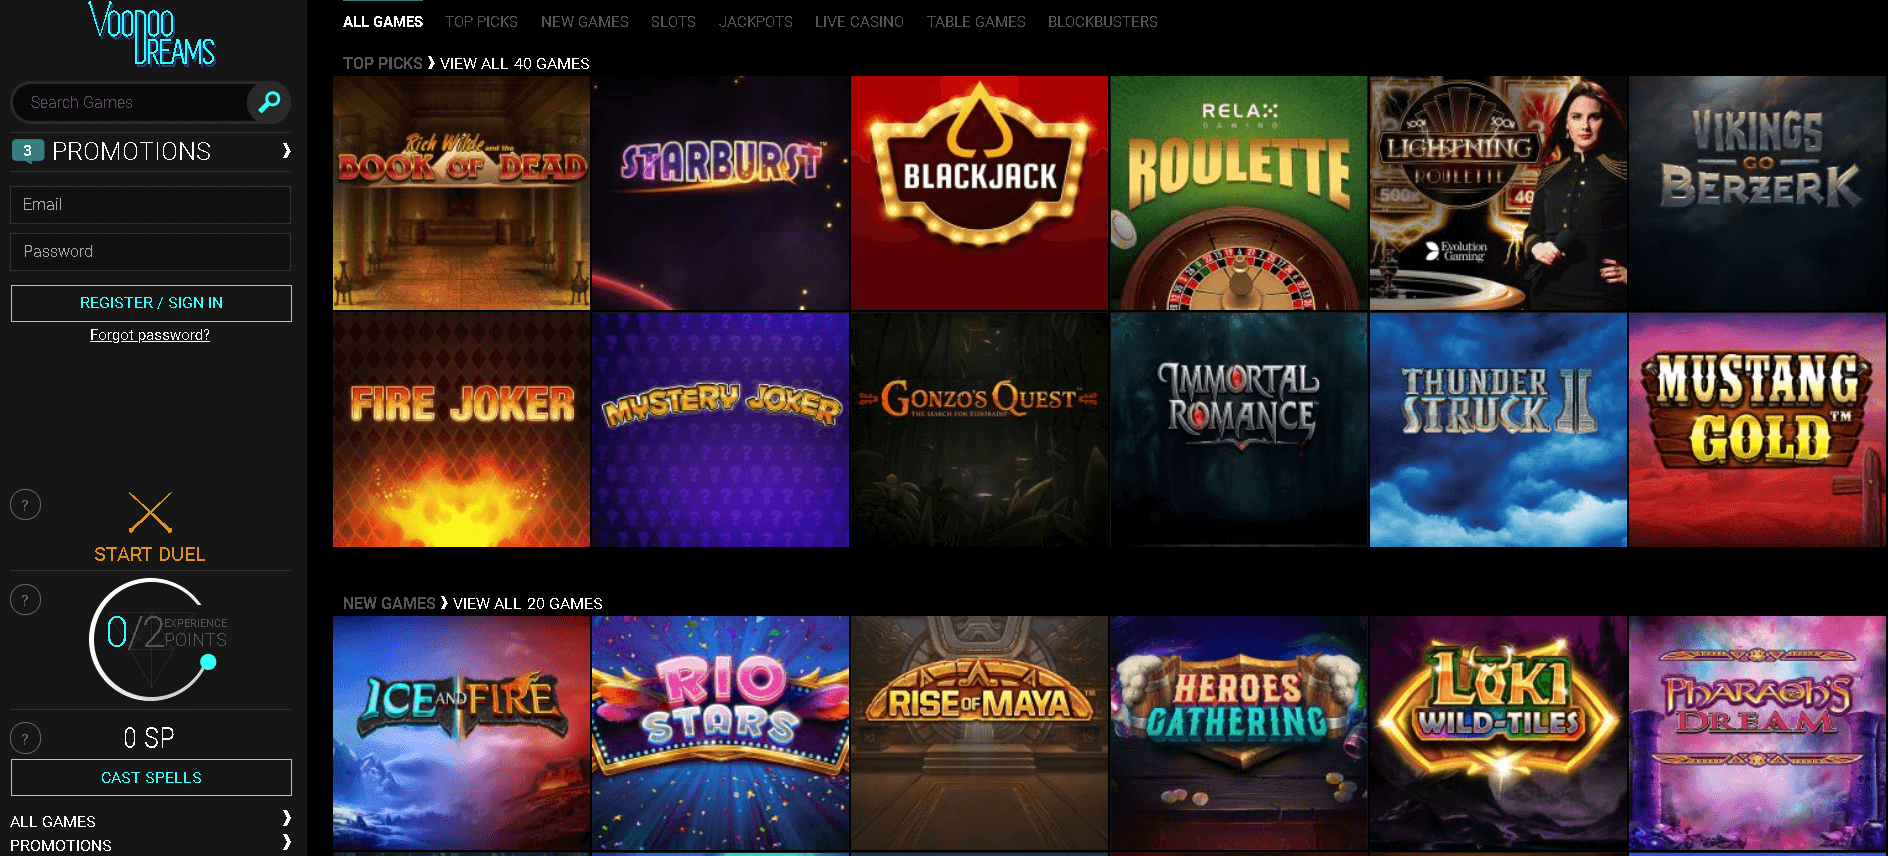 Online private poker room